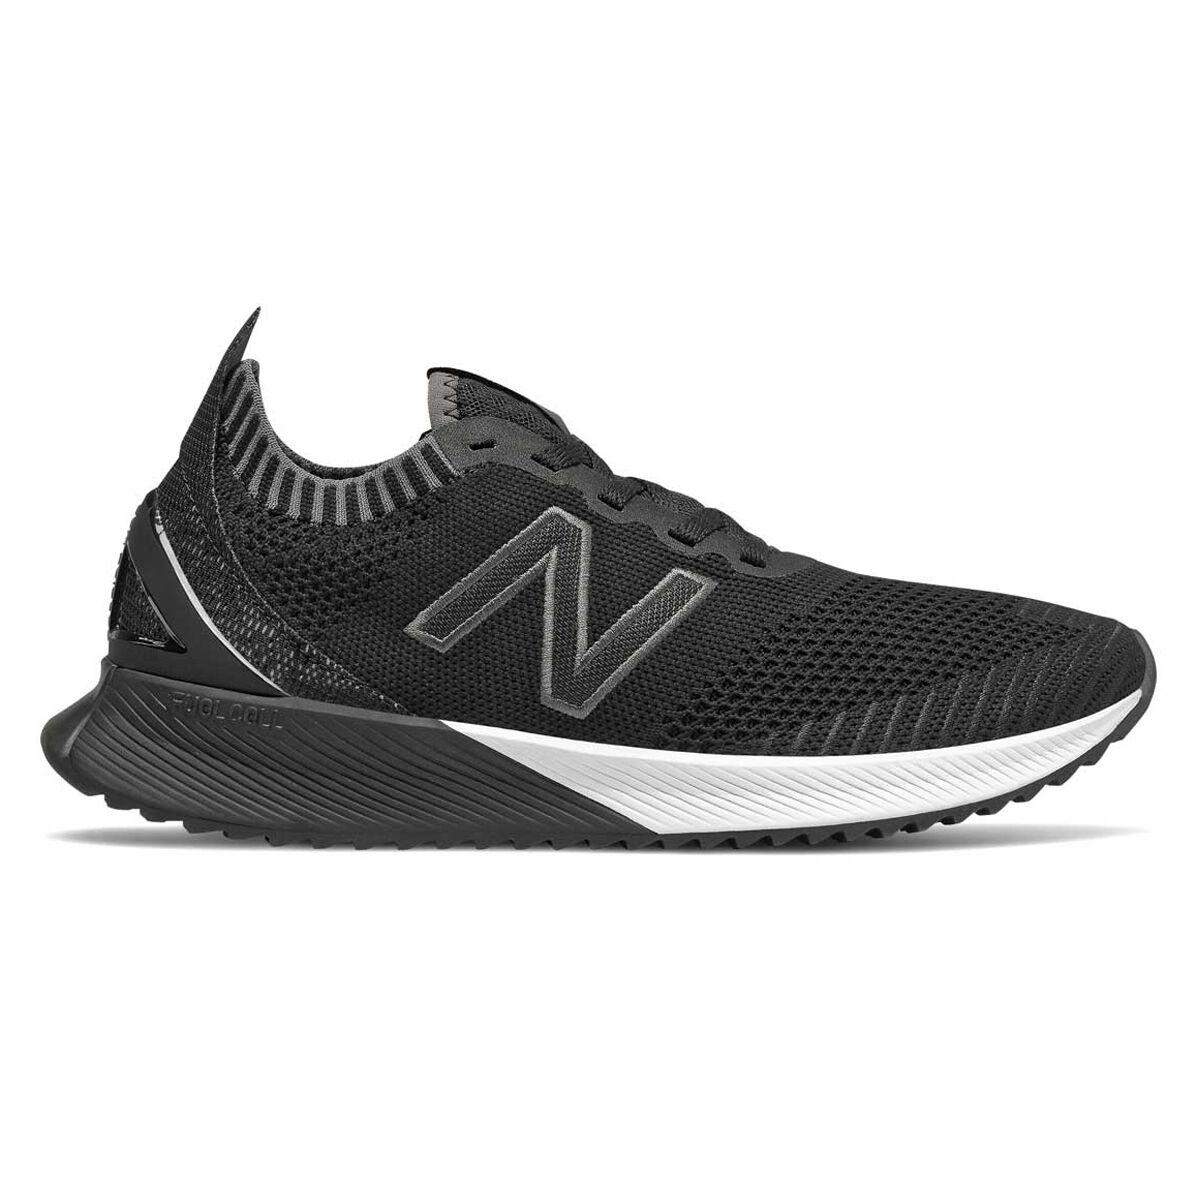 New Balance Echo Womens Running Shoes